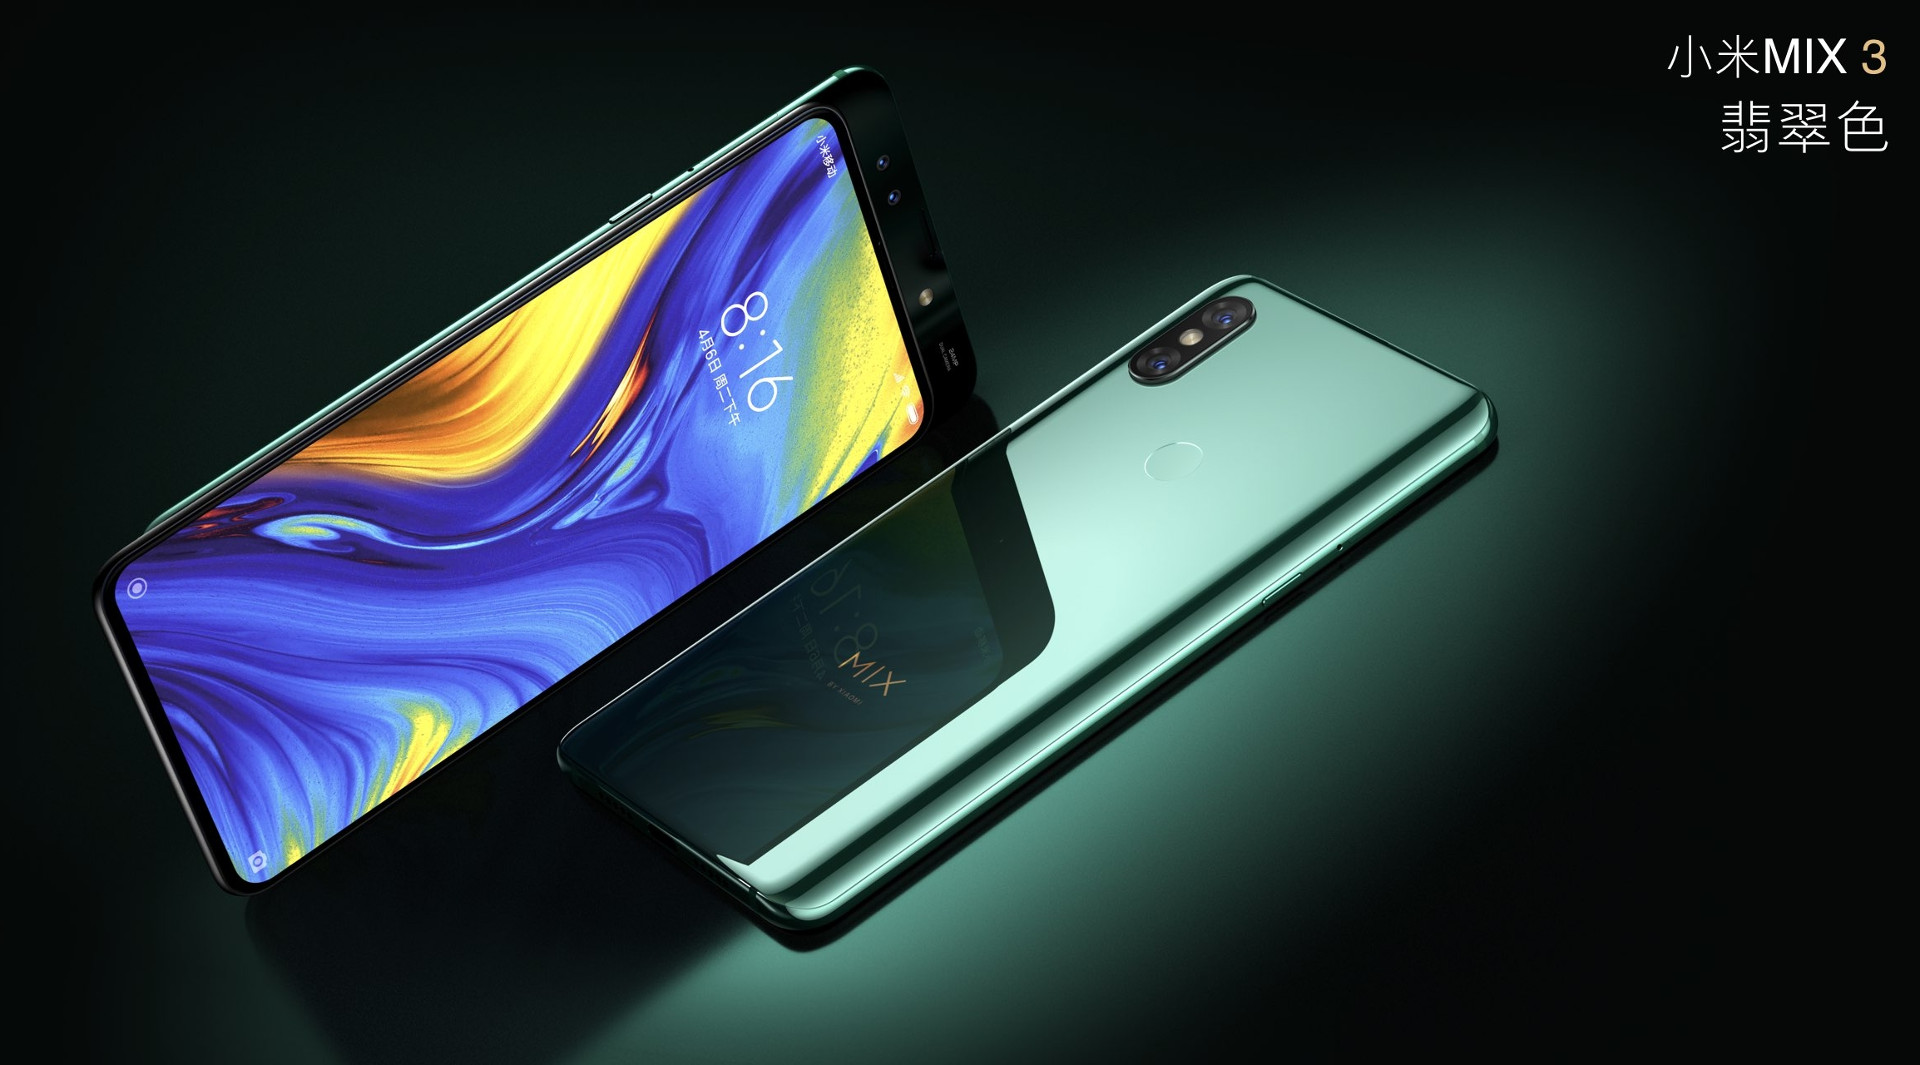 Xiaomi Mi Mix 3 presentación